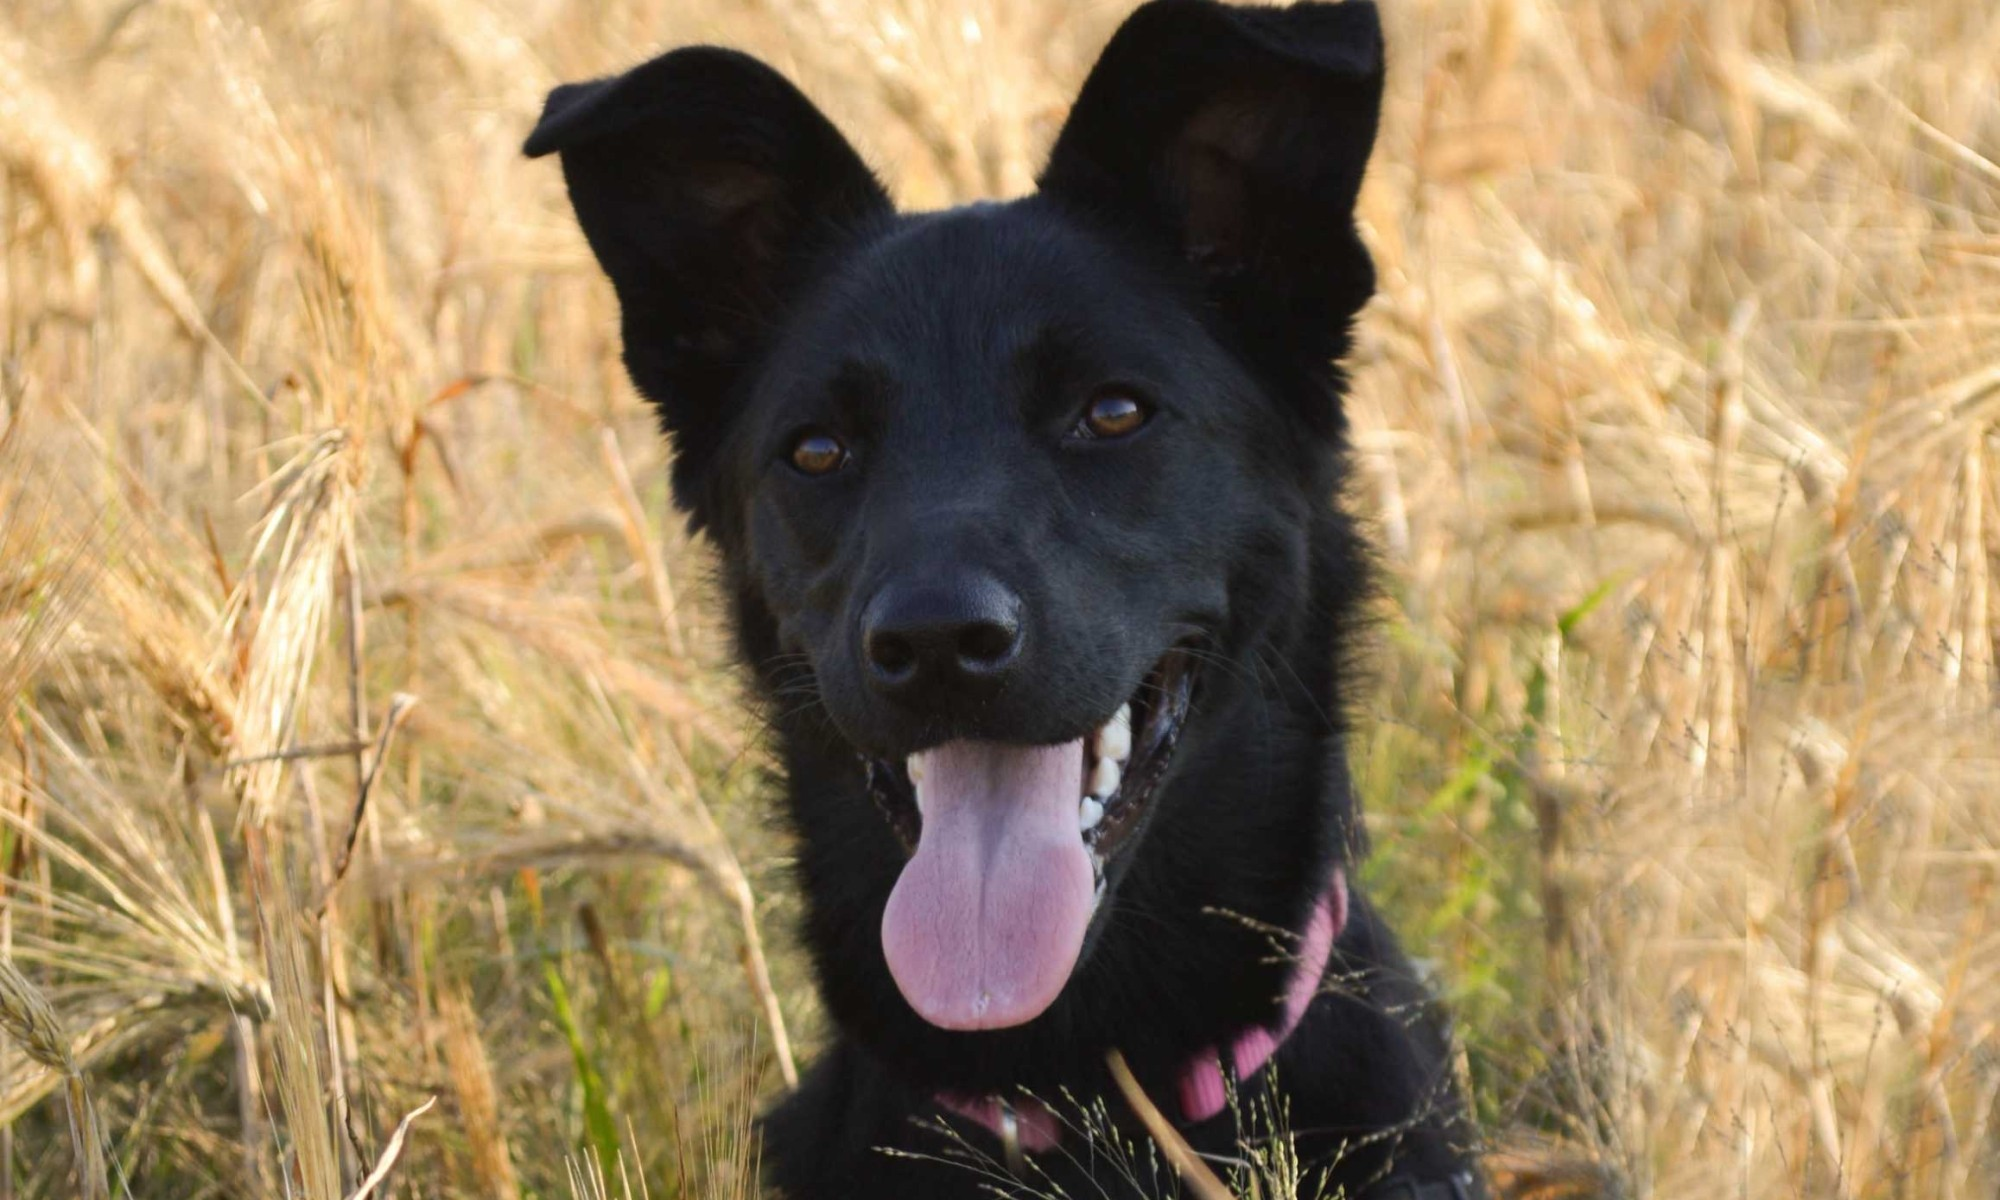 June, the farm dog